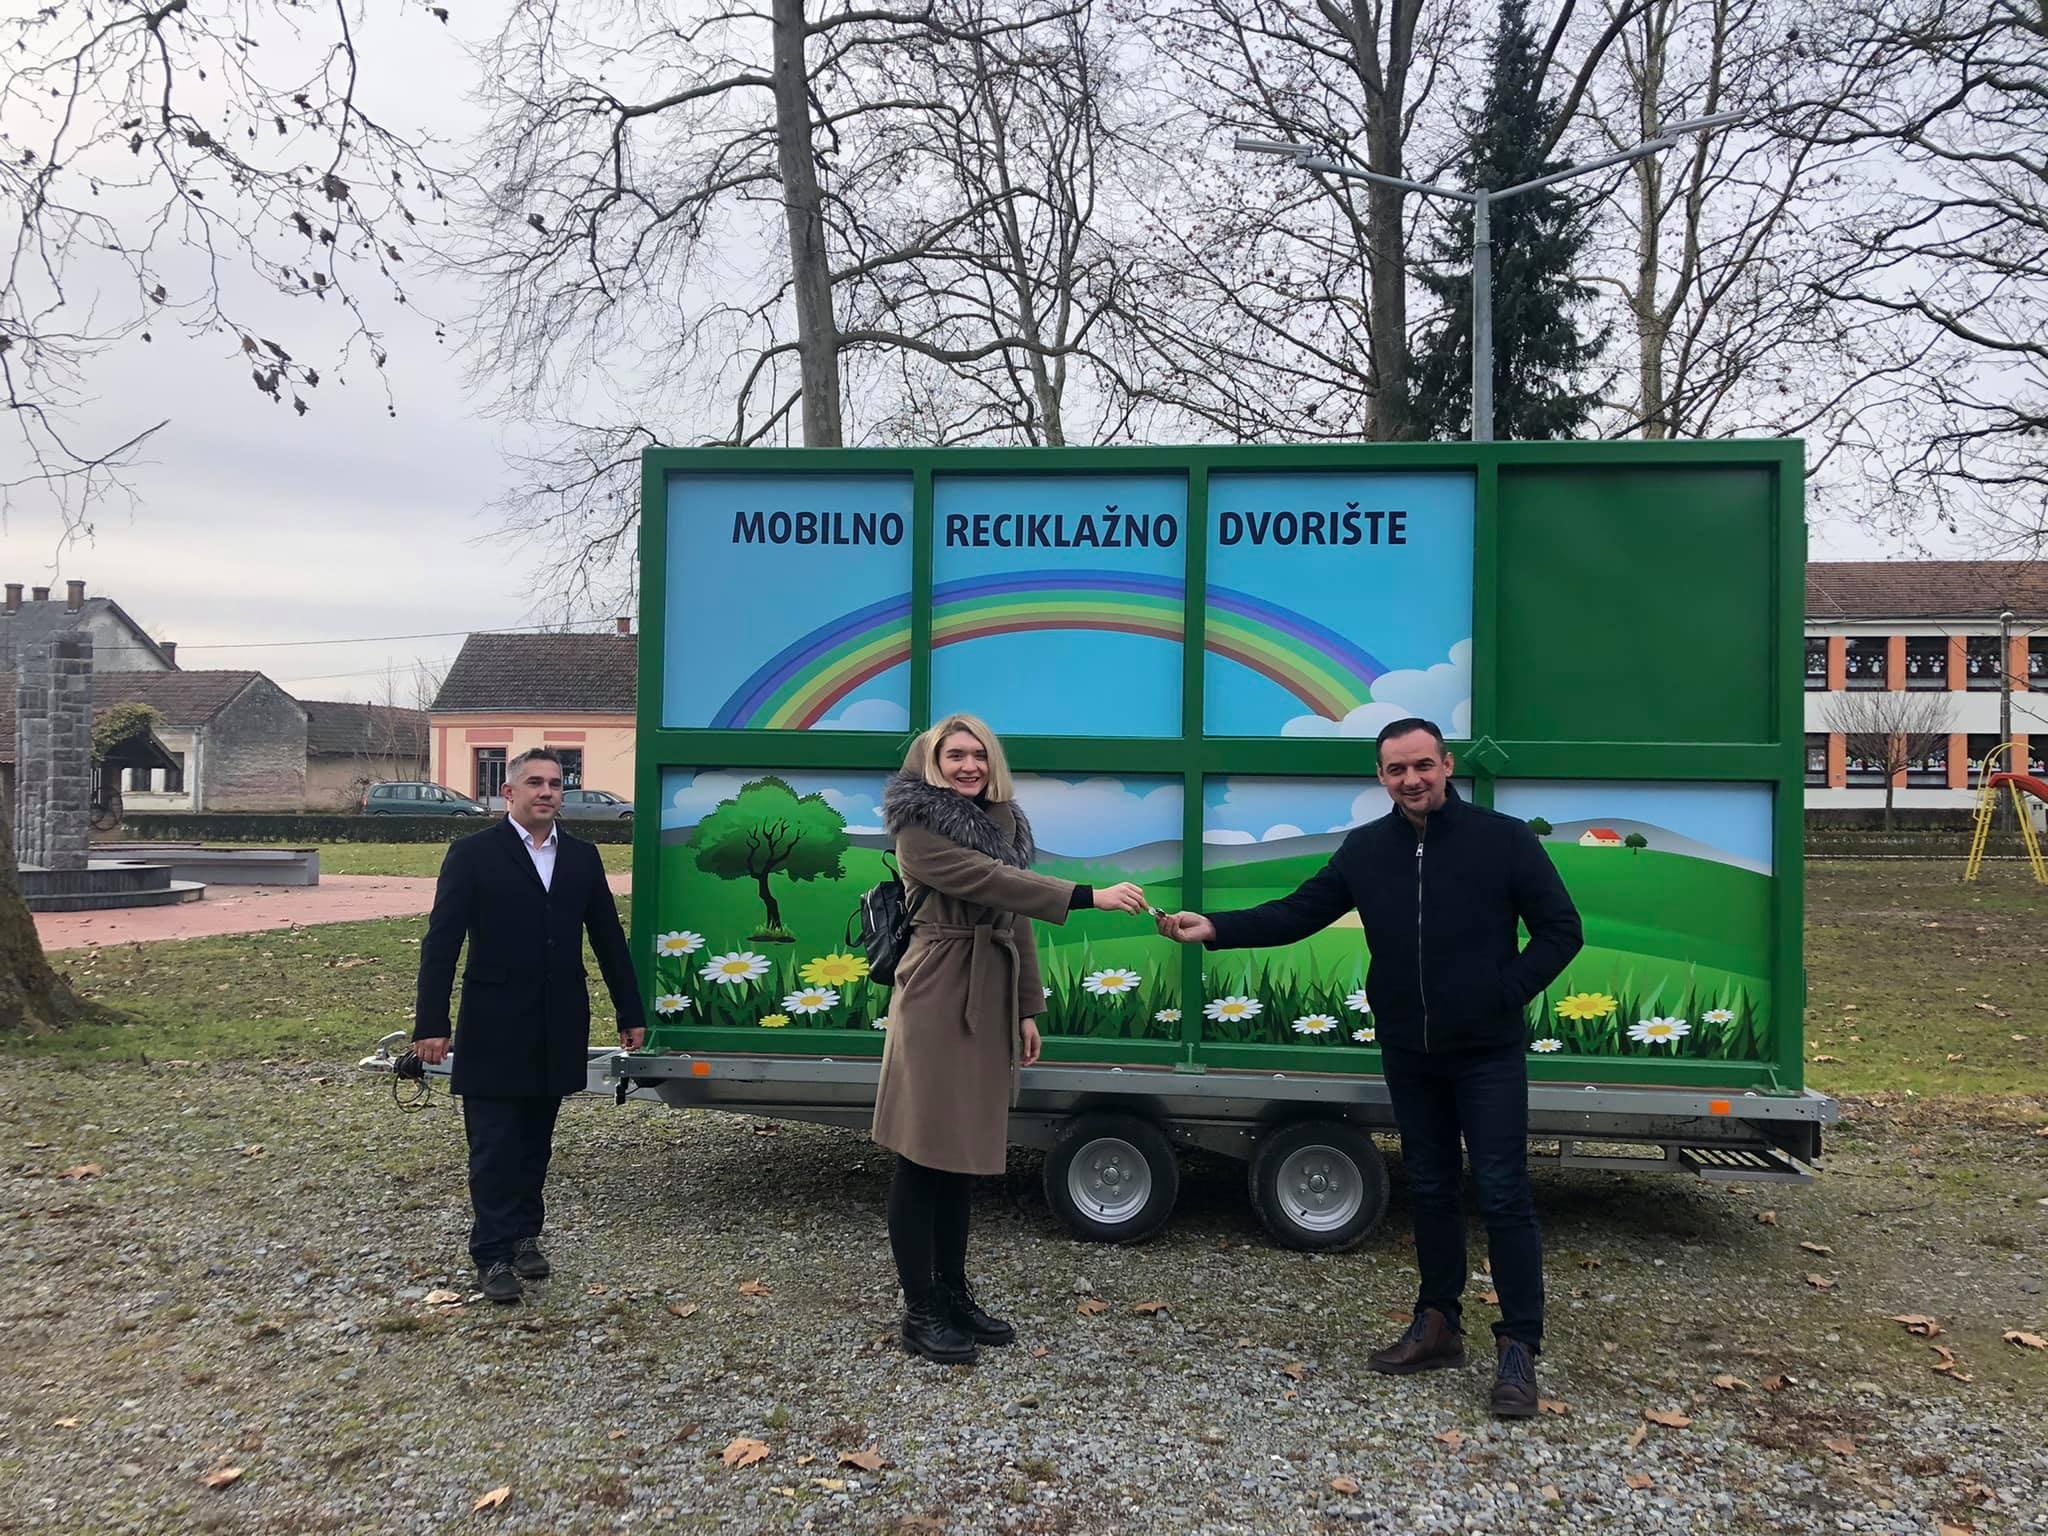 U Veliki Grđevac stiglo mobilno reciklažno dvorište